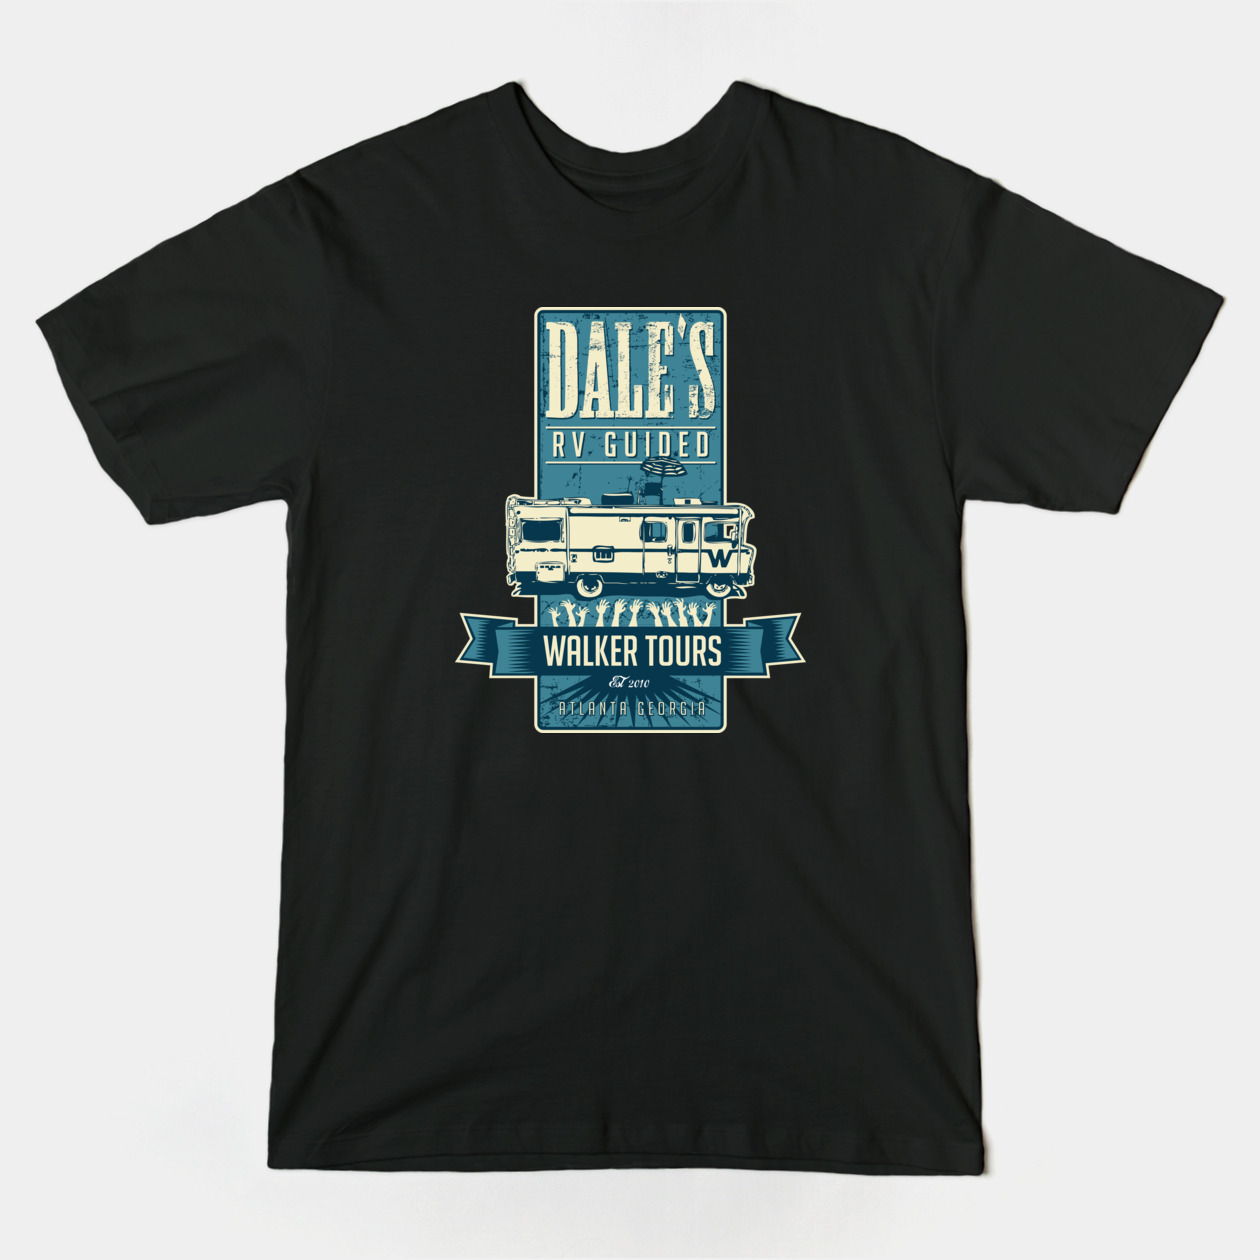 dales rv guided walker tours walking dead t-shirt